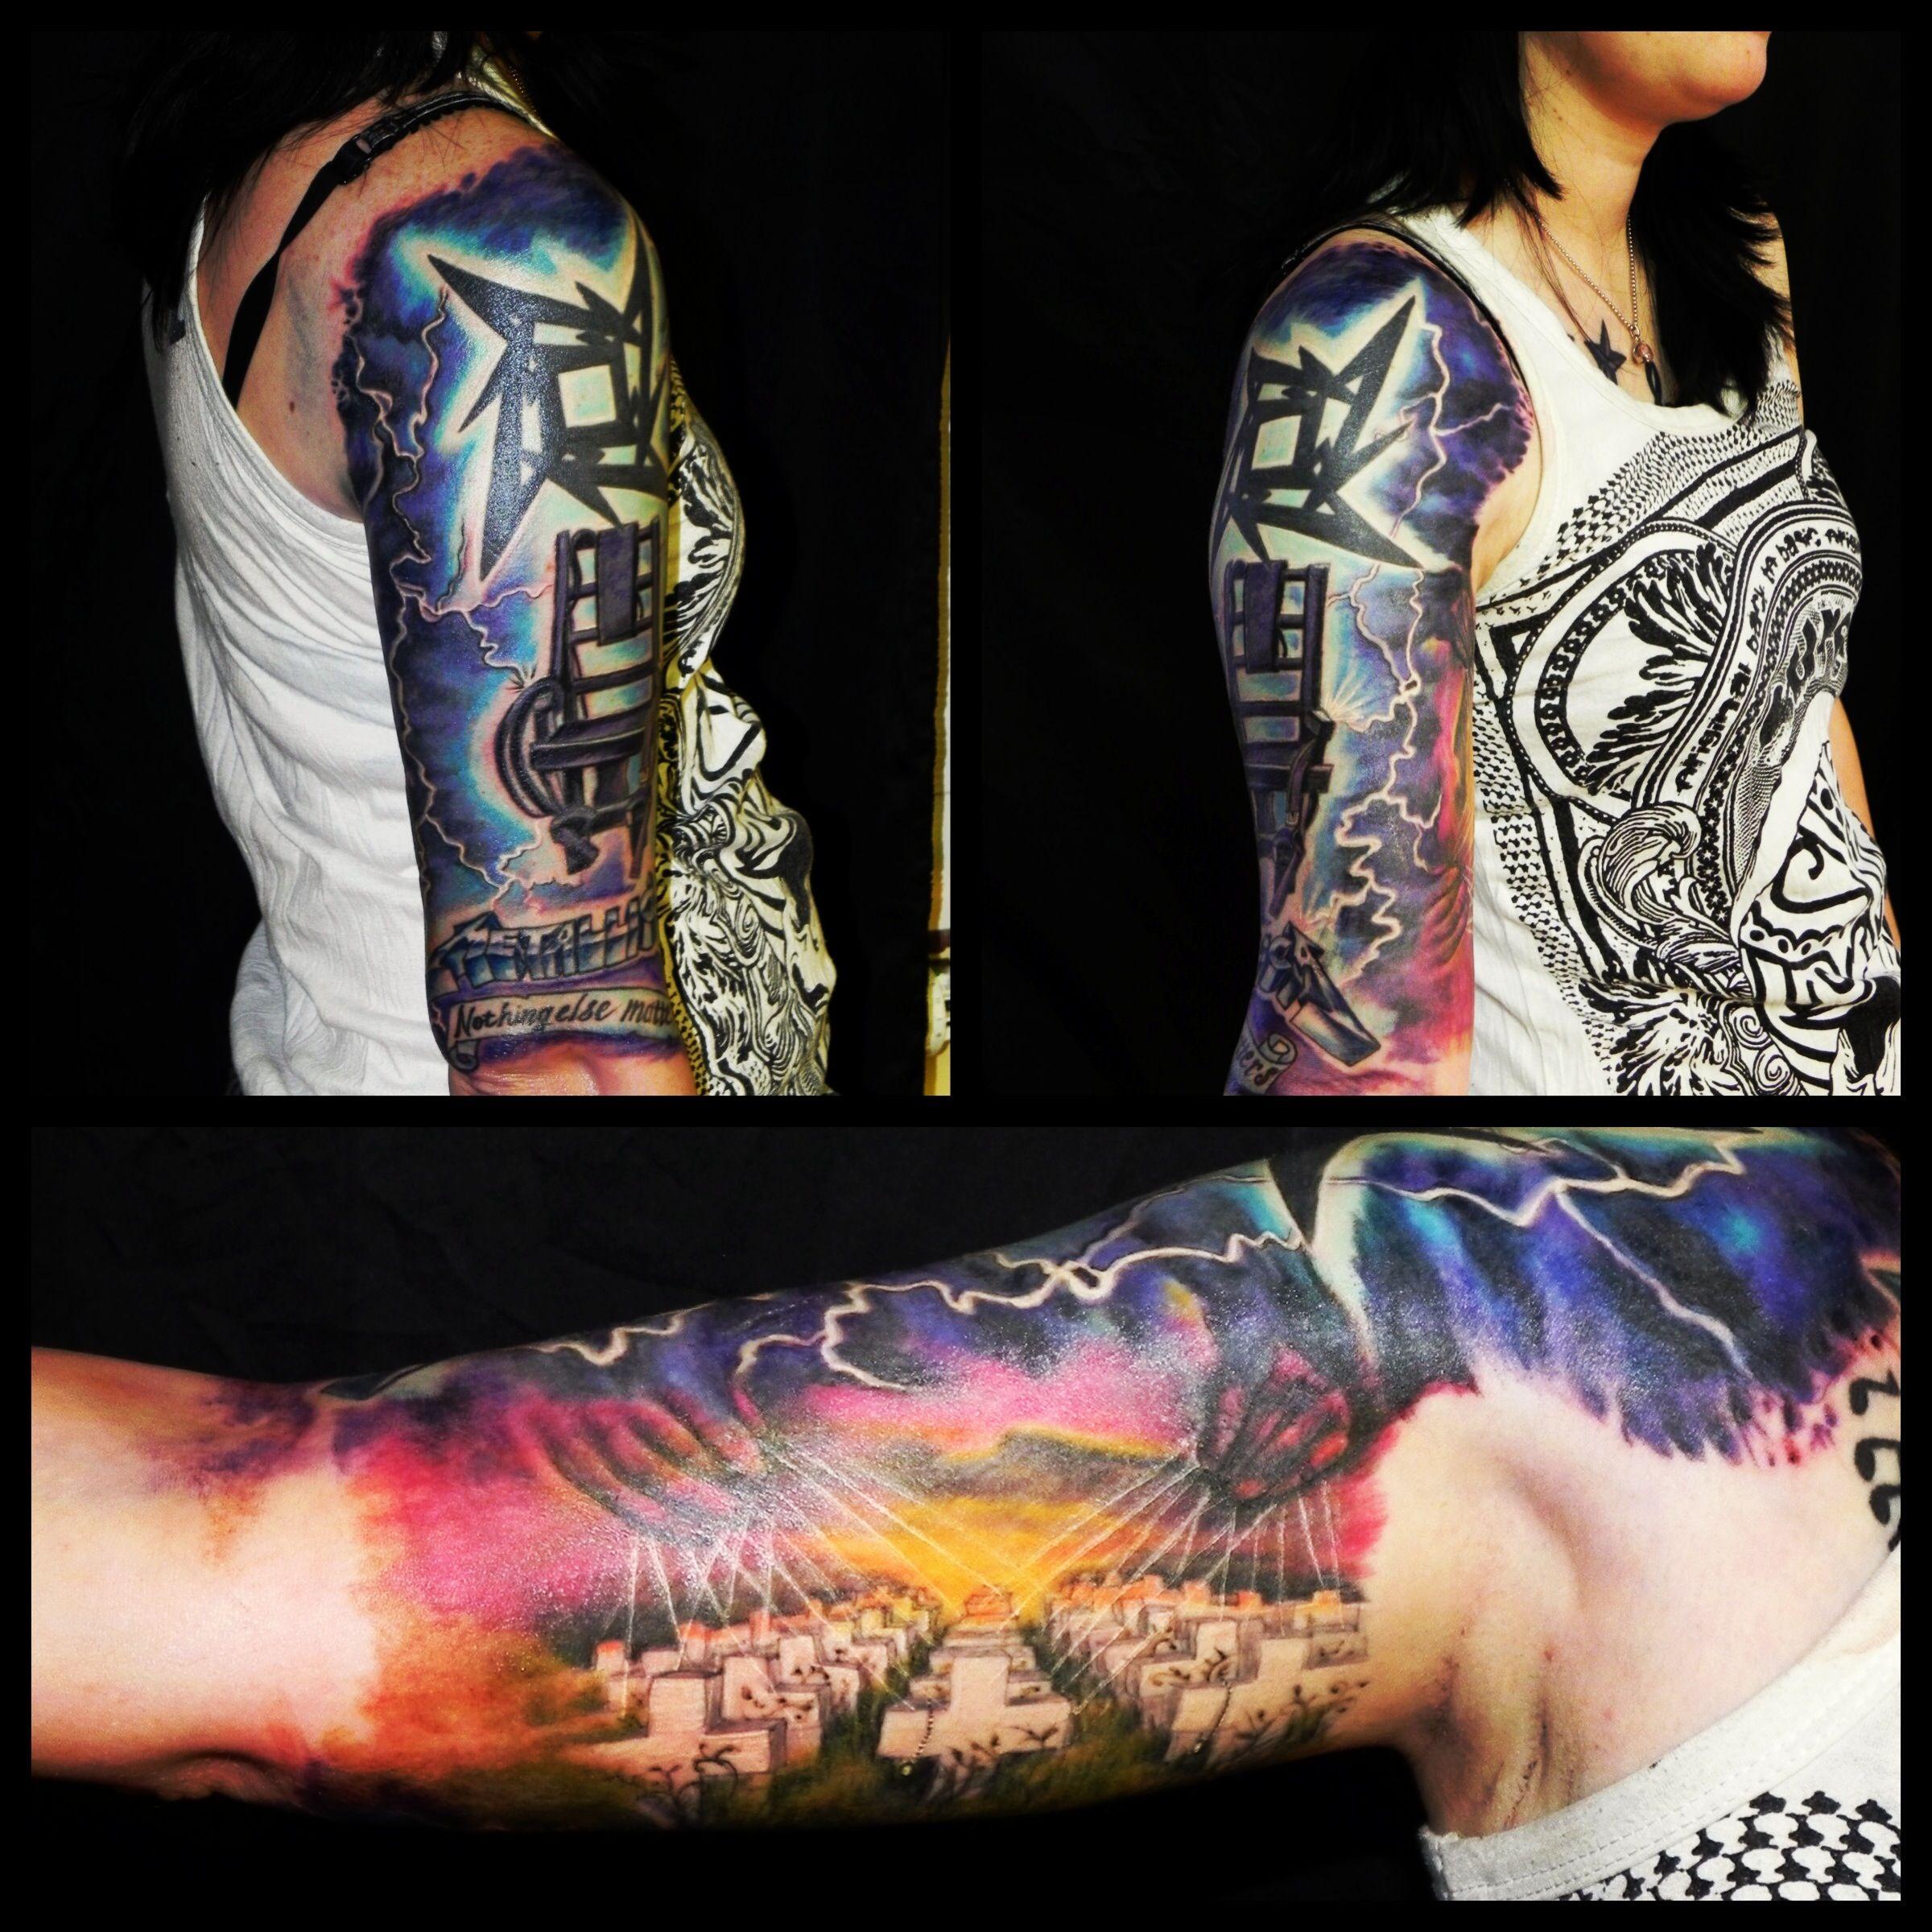 Metallica tattoo color jewelry piercings tattoos for Metallica sleeve tattoo